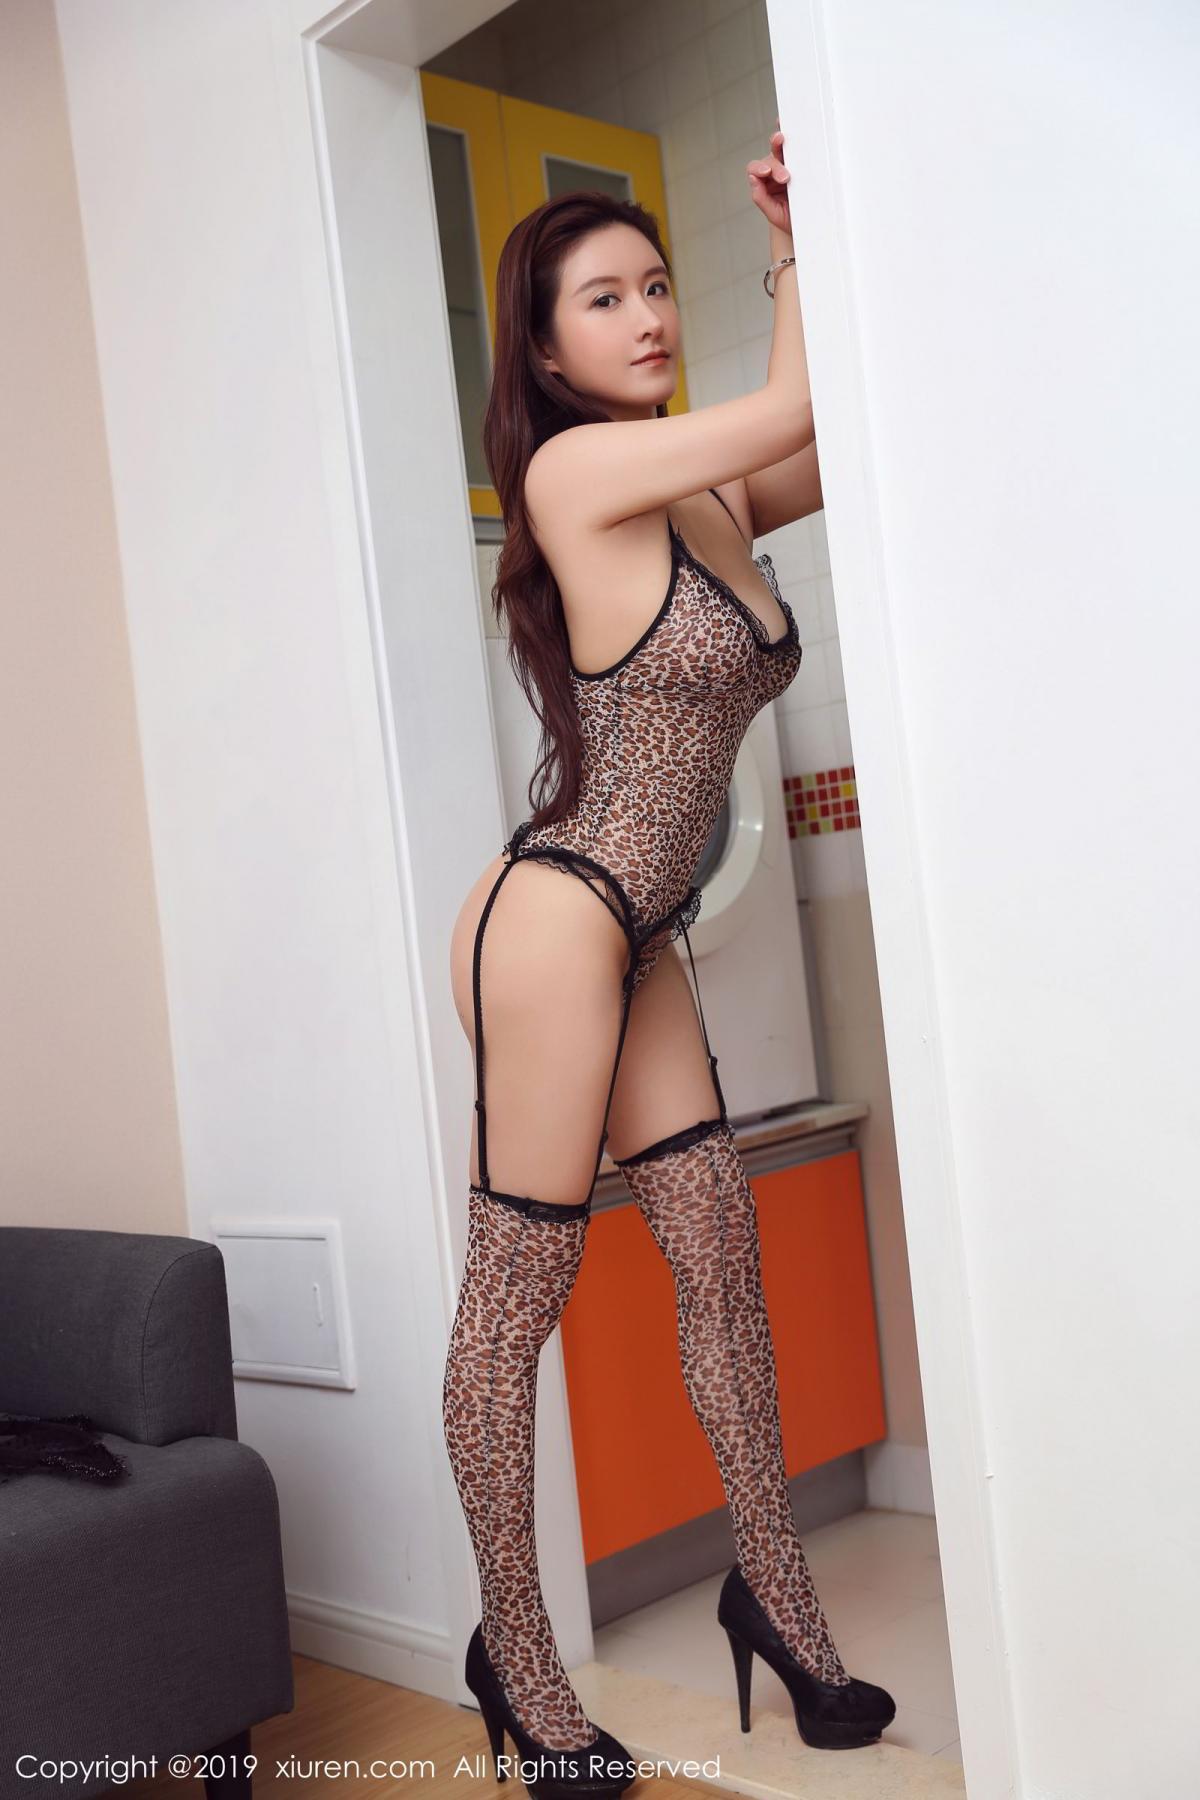 [XiuRen] Vol.1672 Jennanni Jen 21P, Jennanni Jen, Underwear, Xiuren